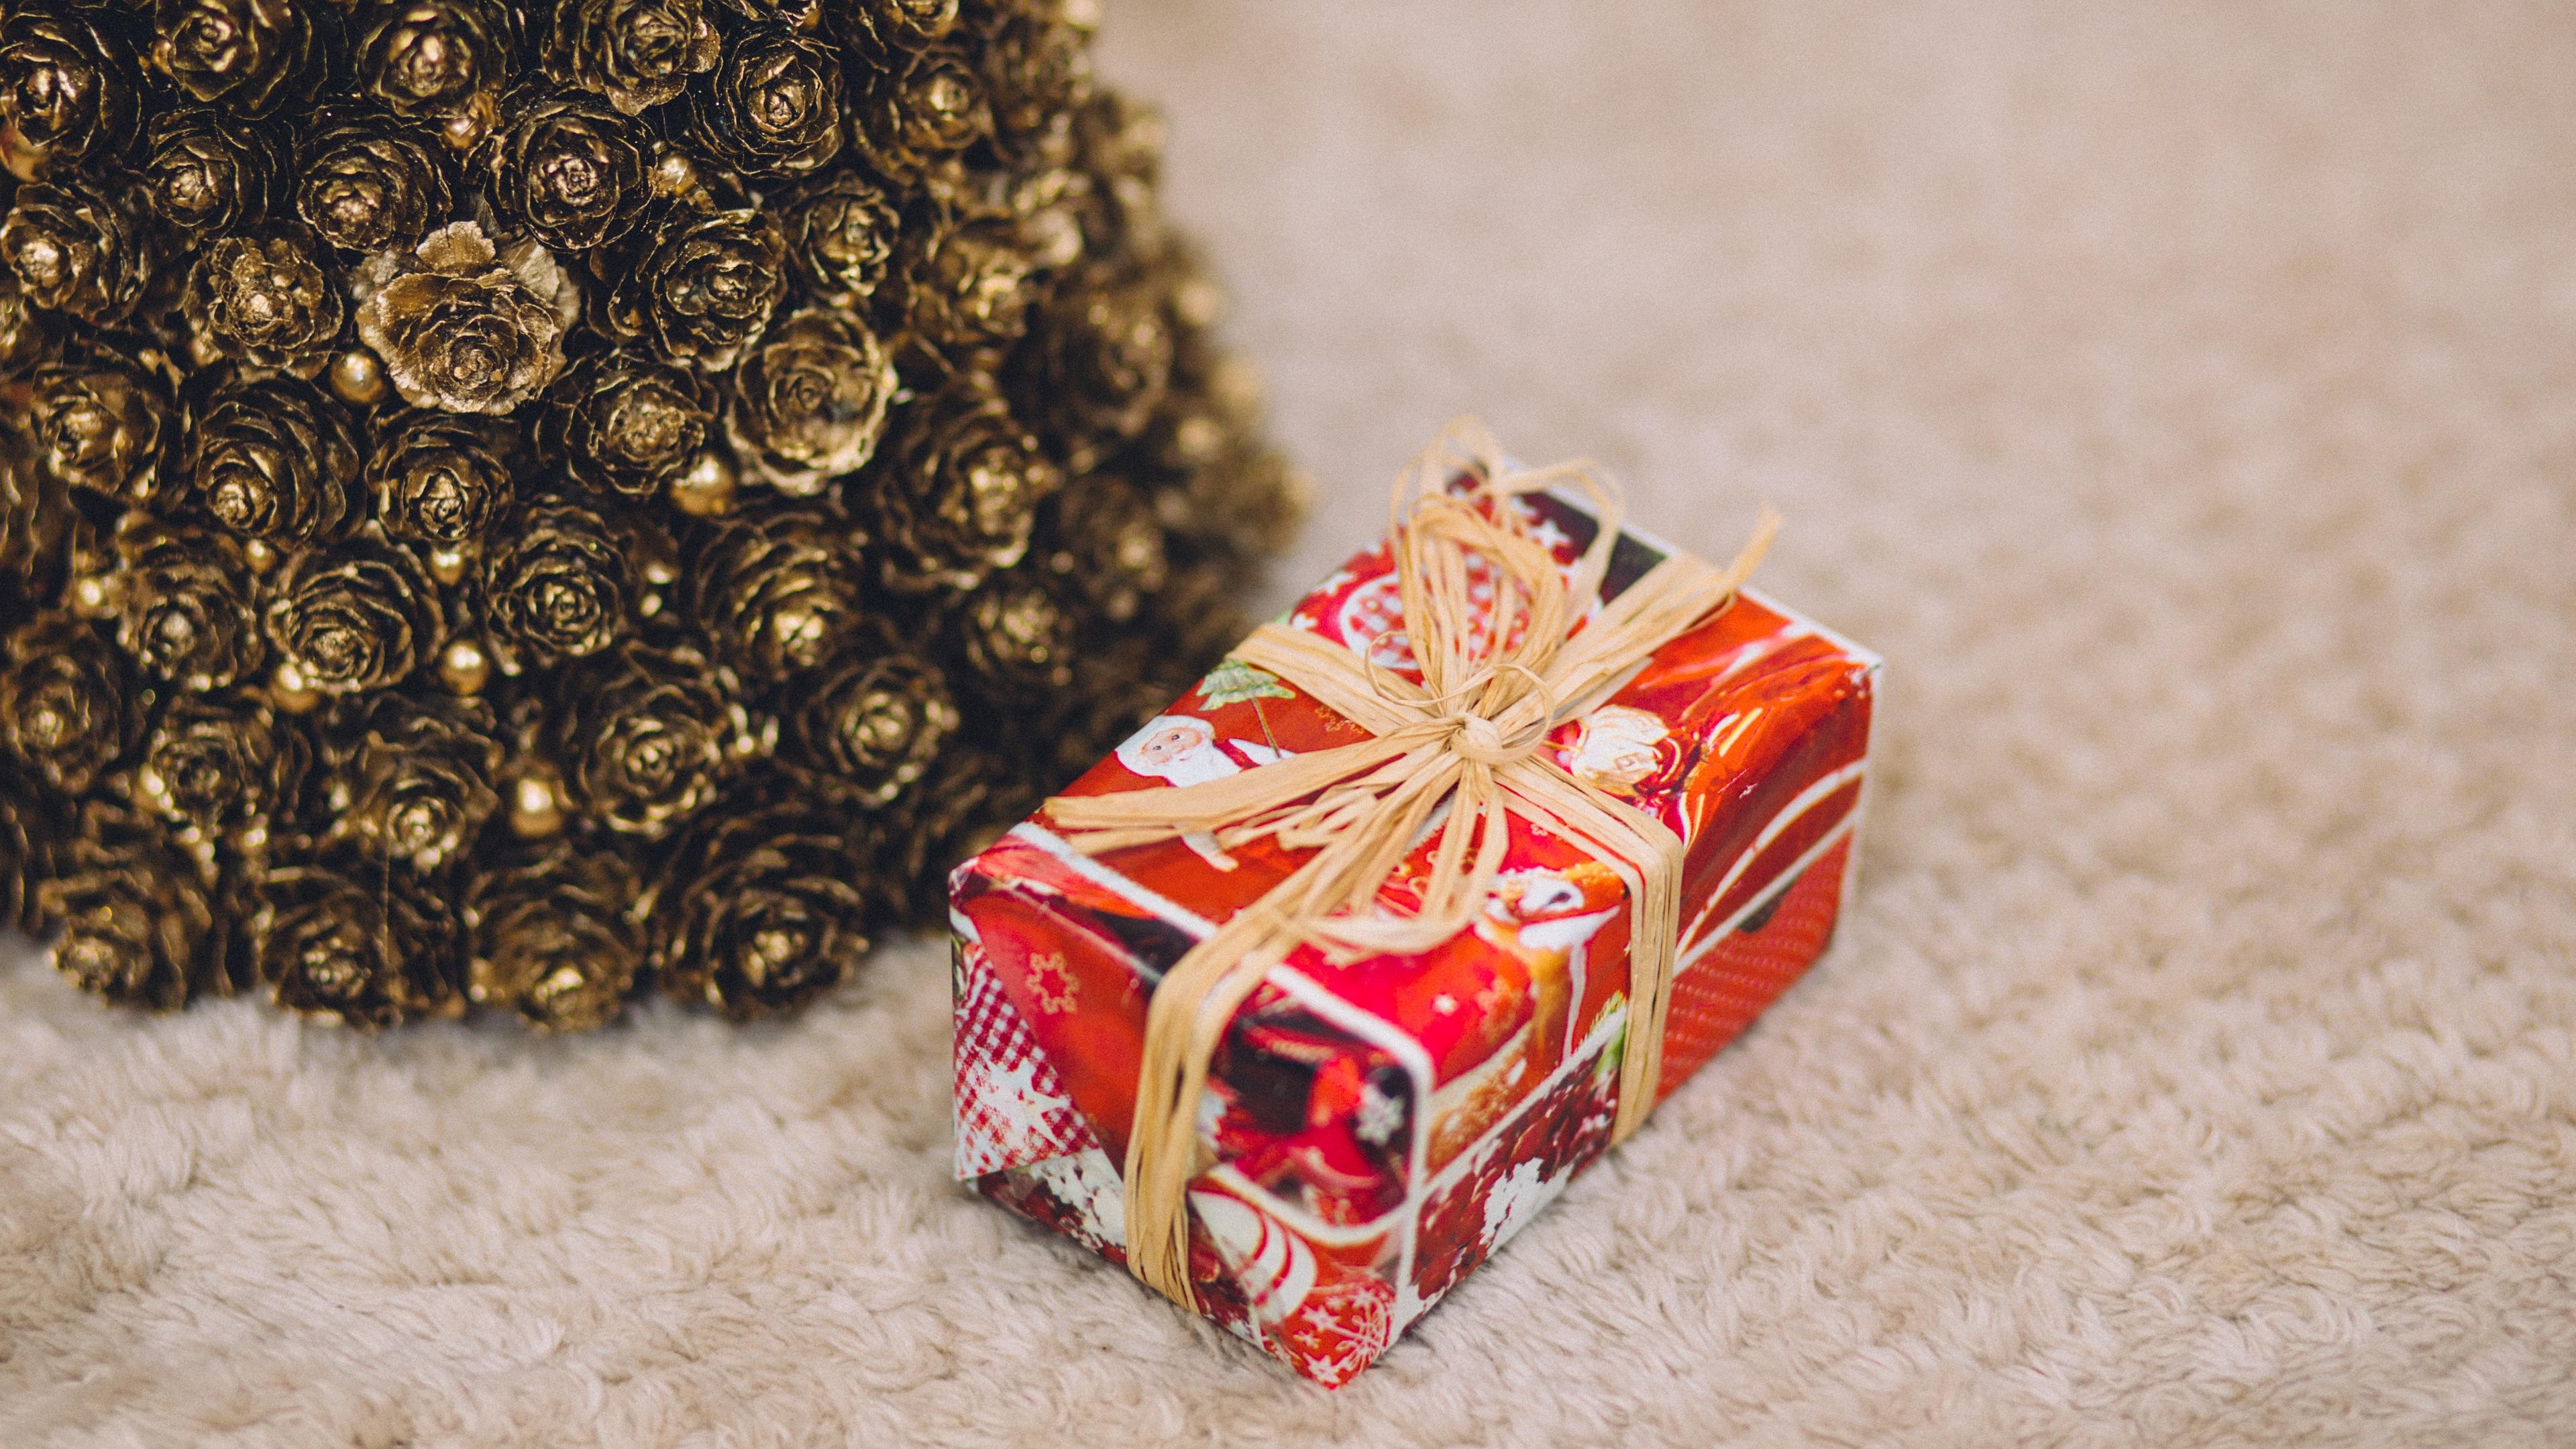 box gift ornaments christmas new year 4k 1538344636 - box, gift, ornaments, christmas, new year 4k - ornaments, Gift, box